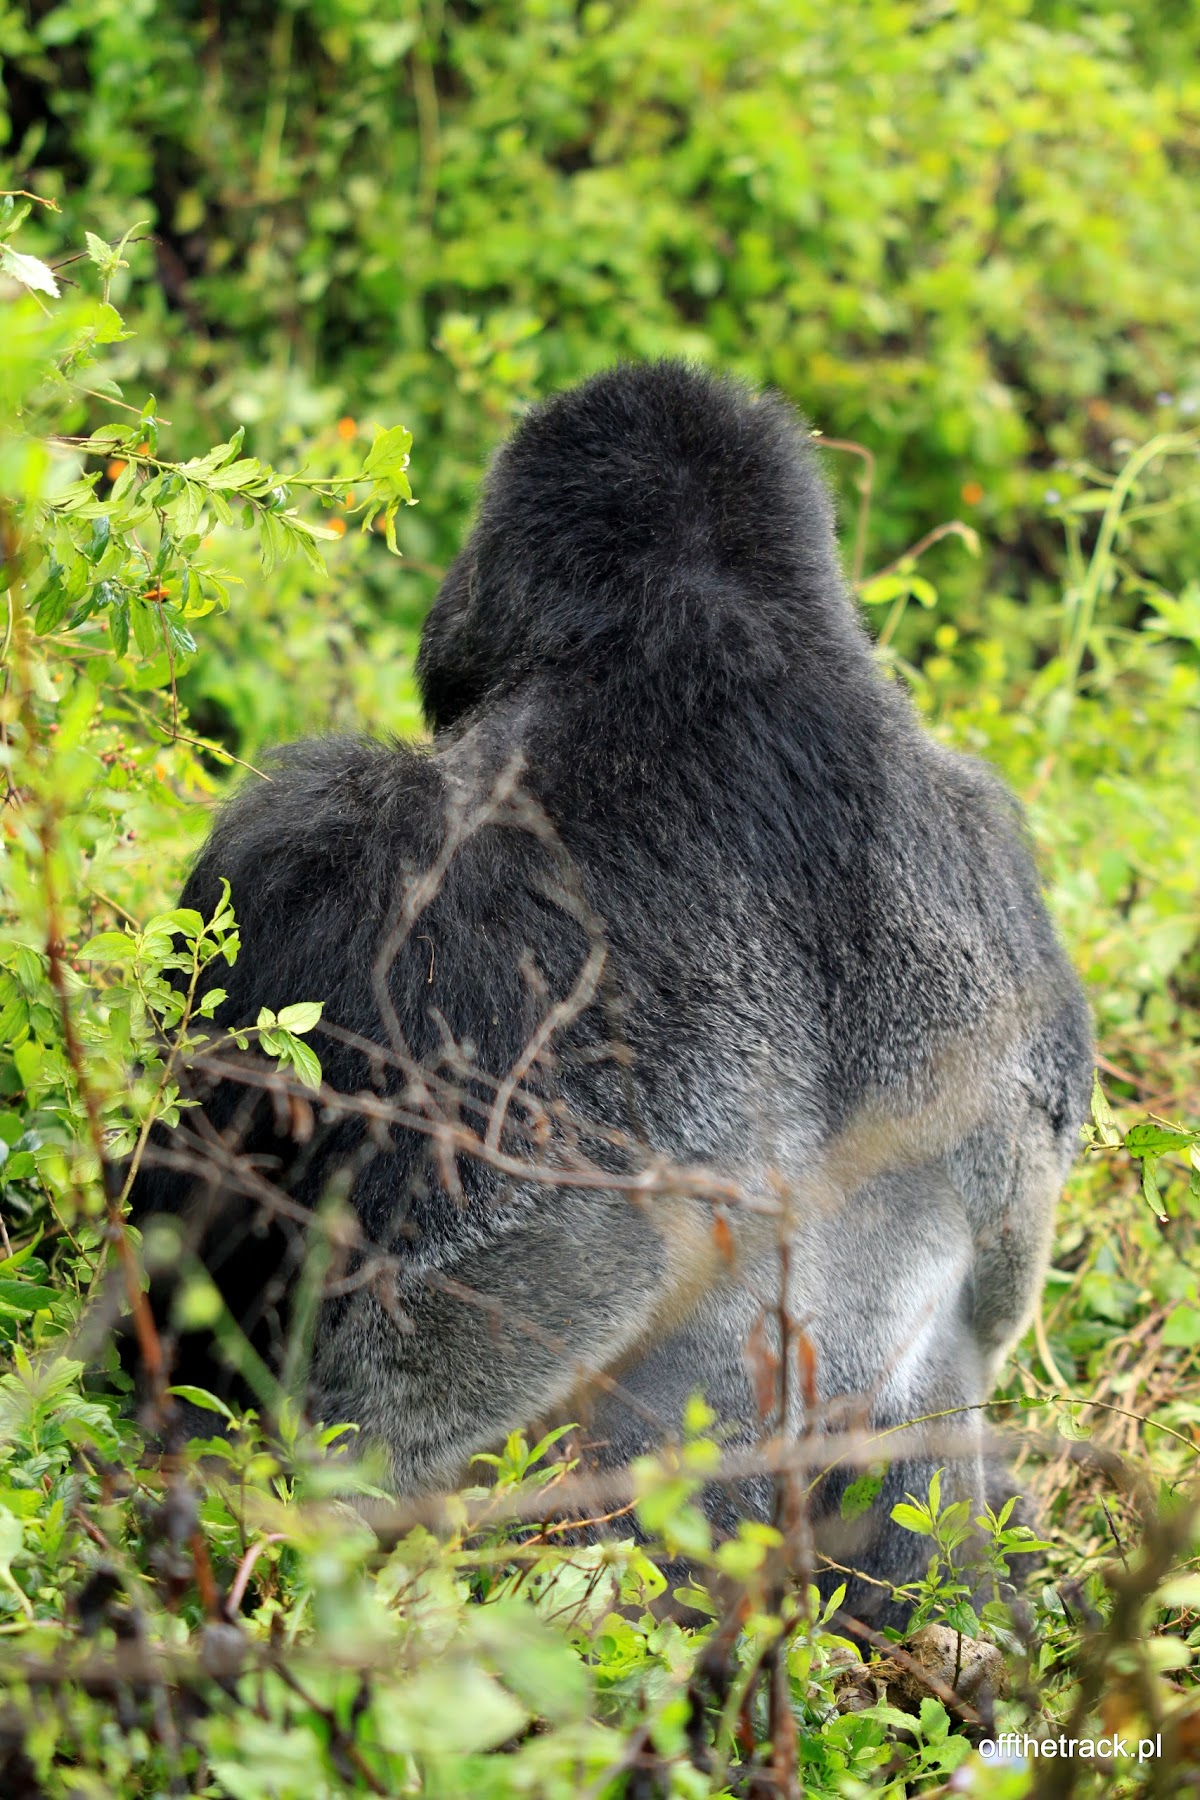 Goryl silverback wśród liści, The Virunga massif region, Uganda